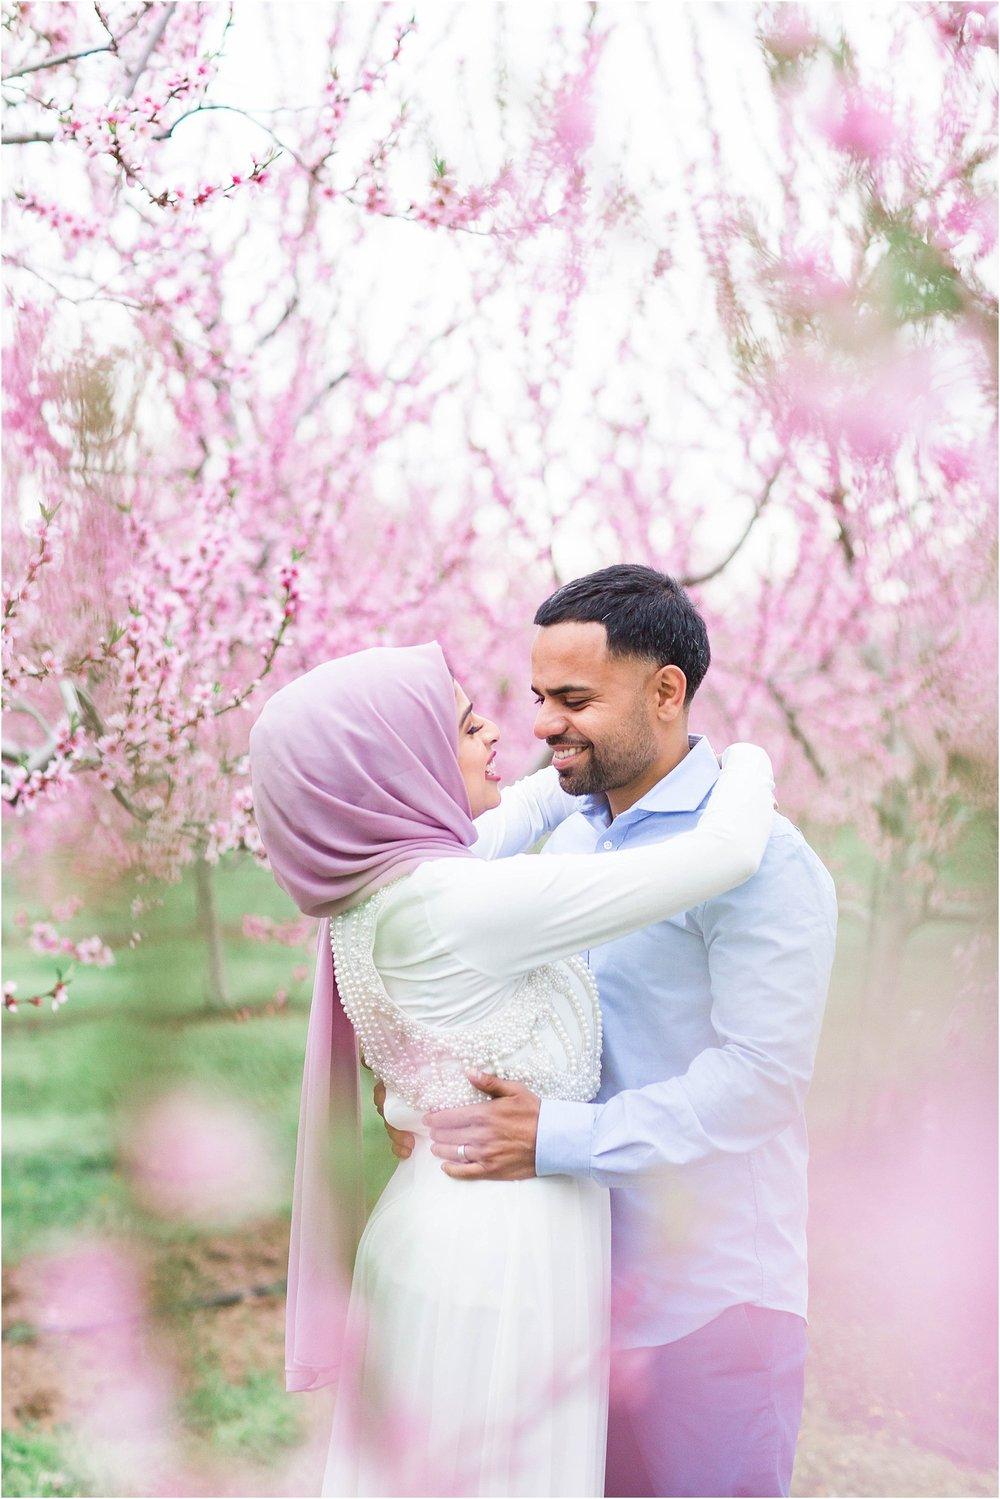 Niagara-on-the-lake-cherry-blossom-farm-Engagement-Session-Toronto-Mississauga-Brampton-Scarborough-GTA-Pakistani-Indian-Wedding-Engagement-Photographer-Photography_0035.jpg